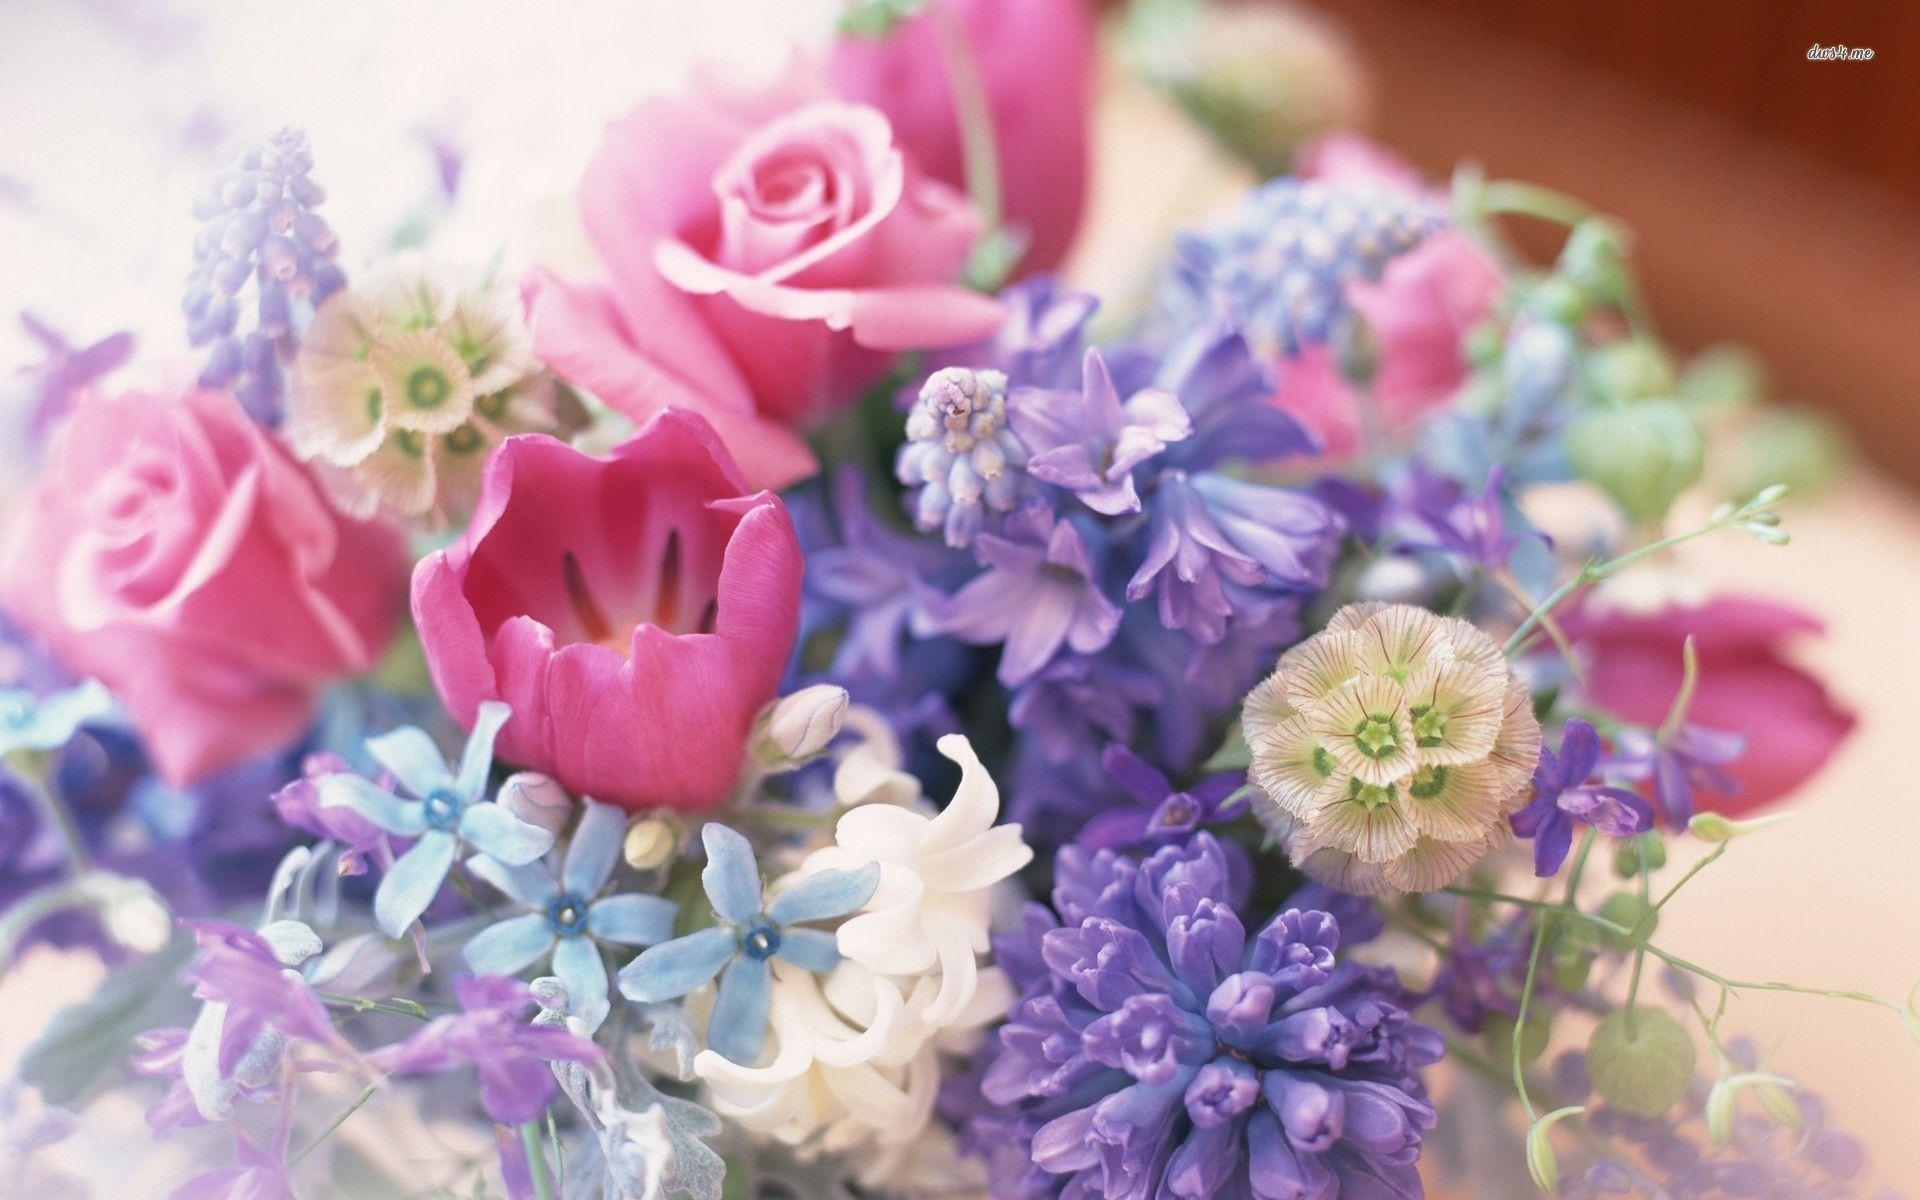 happy birthday bouquet wallpaper - photo #34